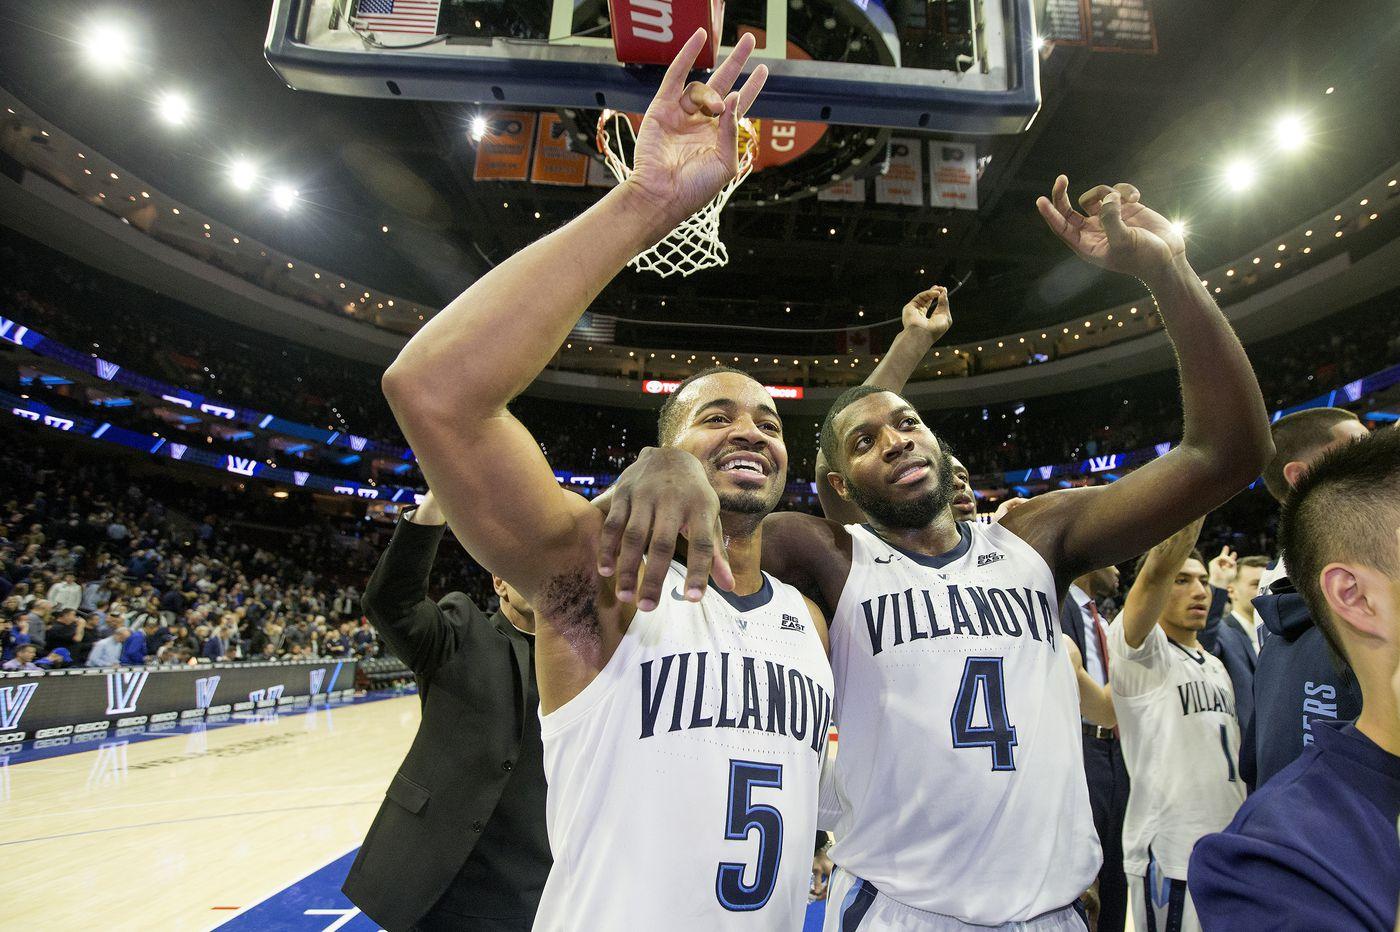 Villanova underclassmen appreciate the leadership of seniors Phil Booth and Eric Paschall entering NCAA Tournament